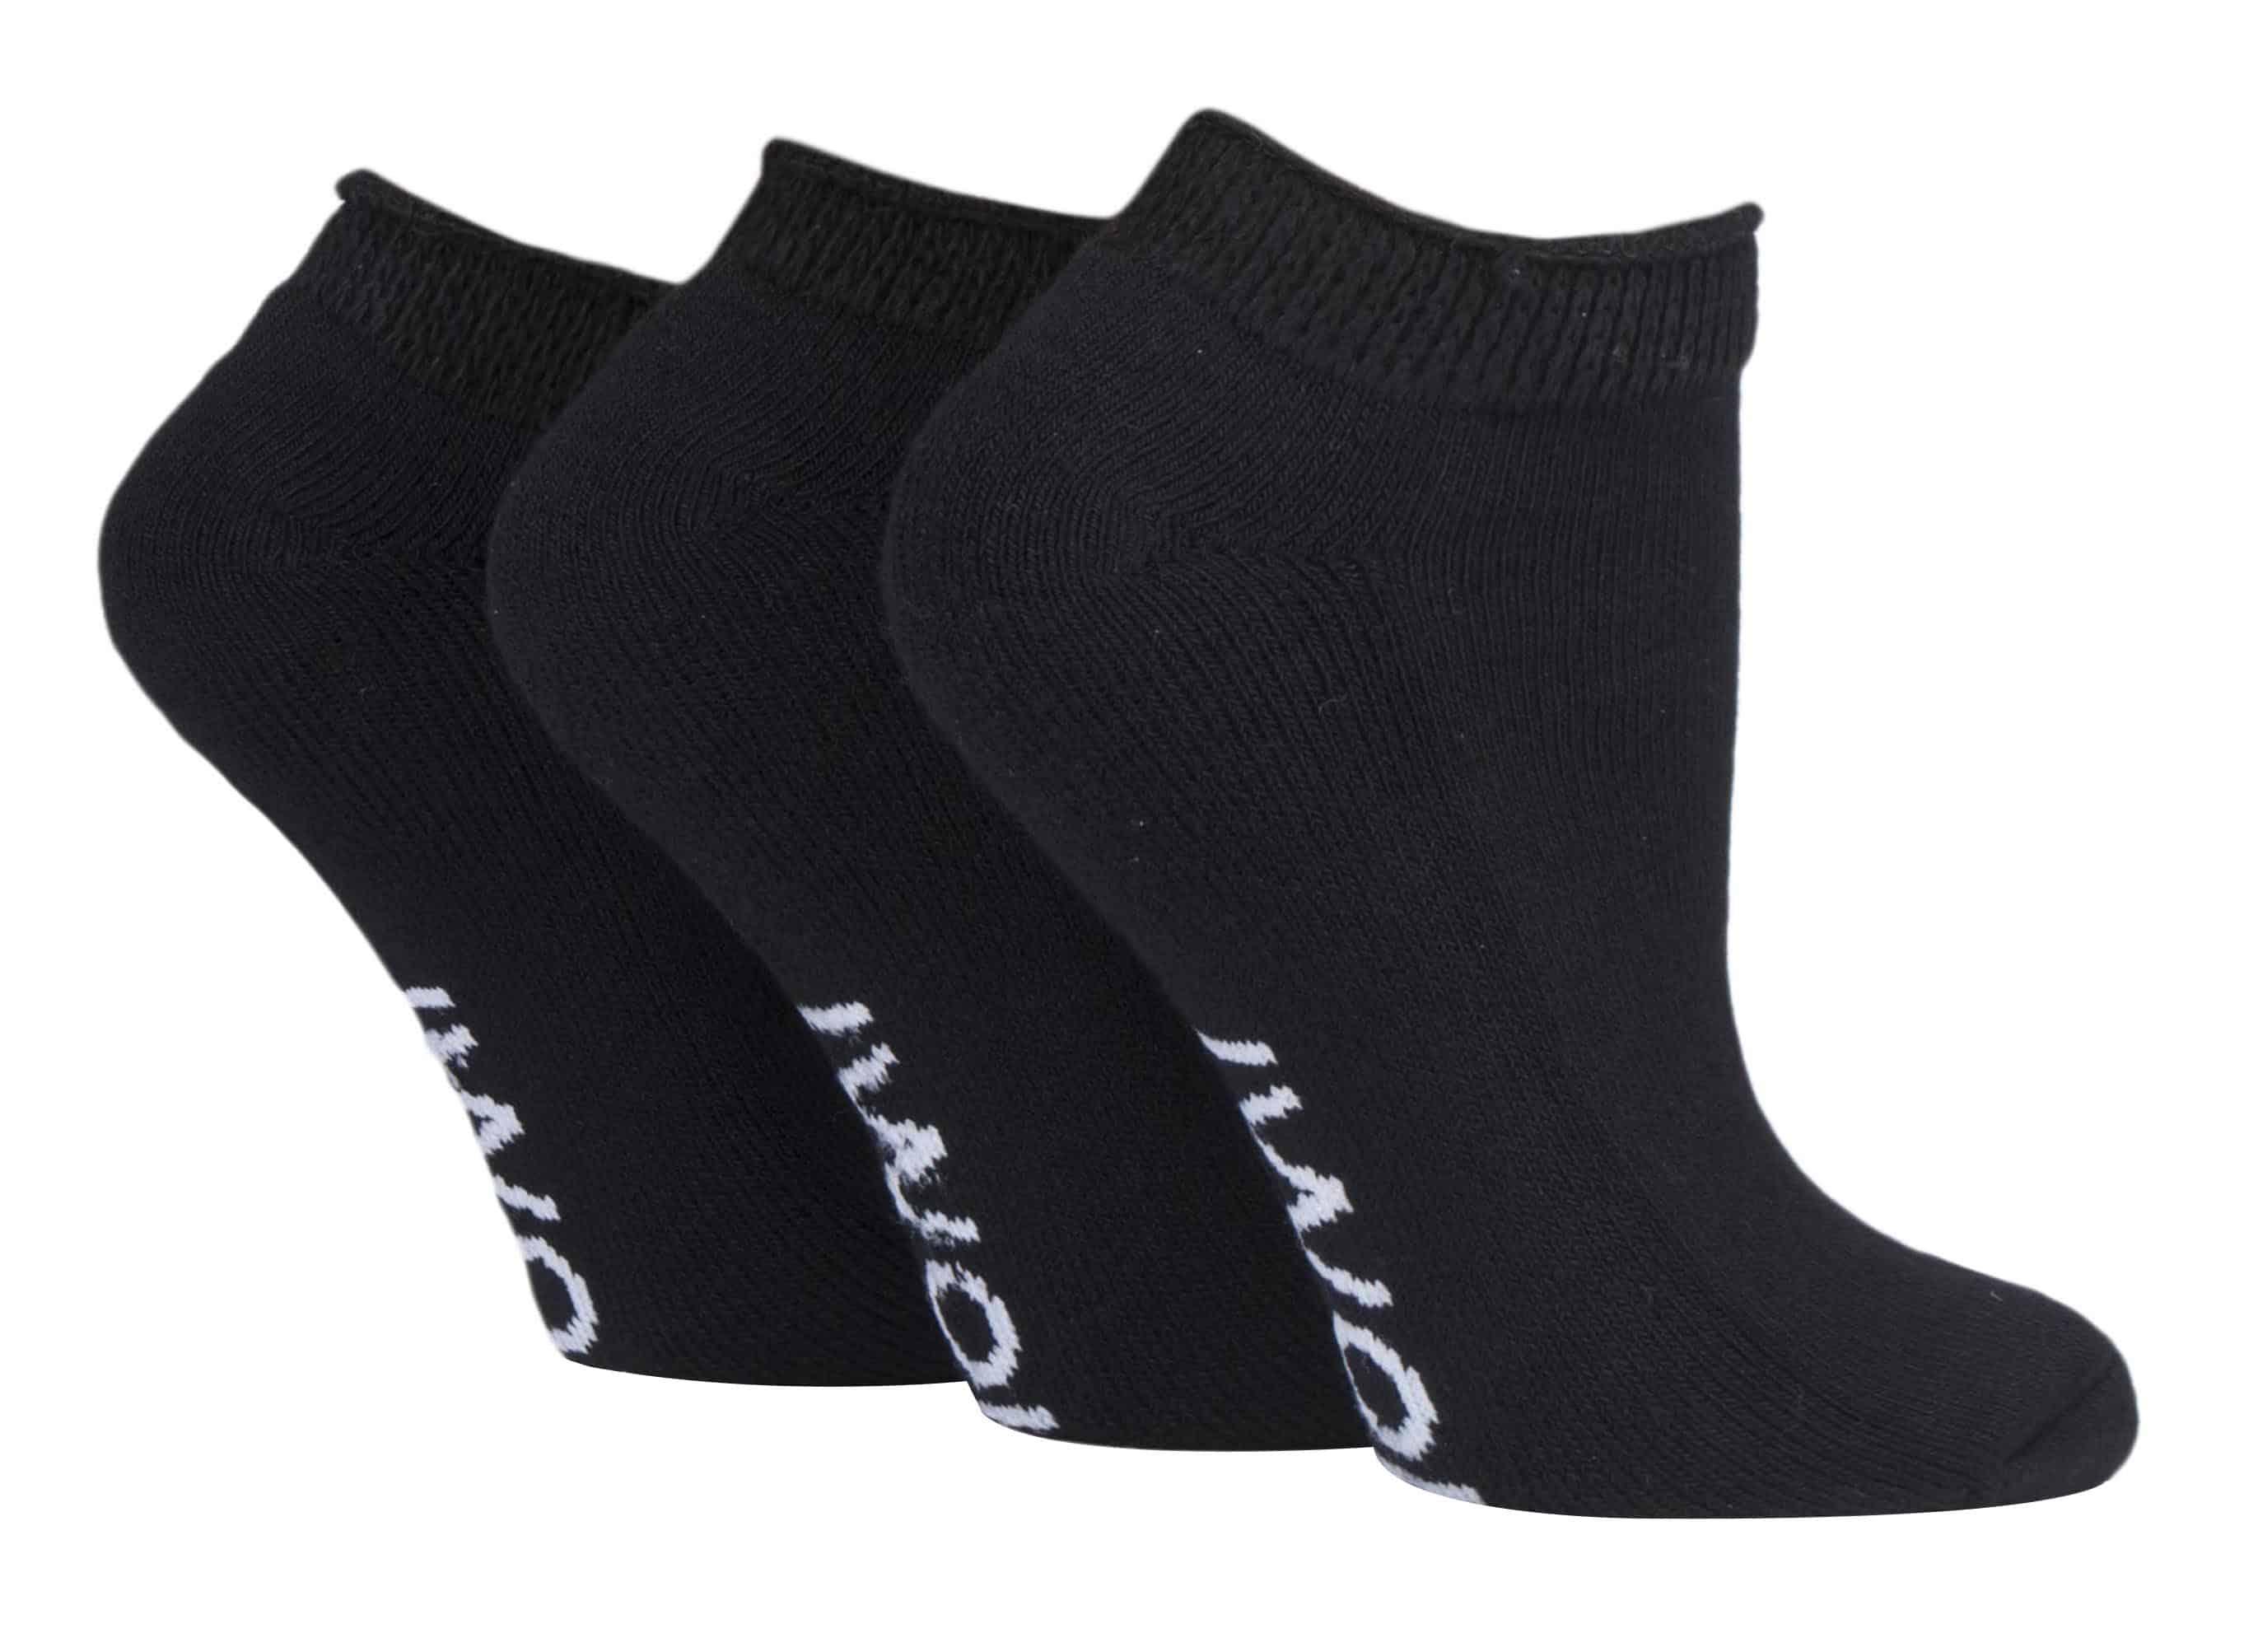 LADIES BLACK IOMI TRAINER SOCKS LEG SHOTS